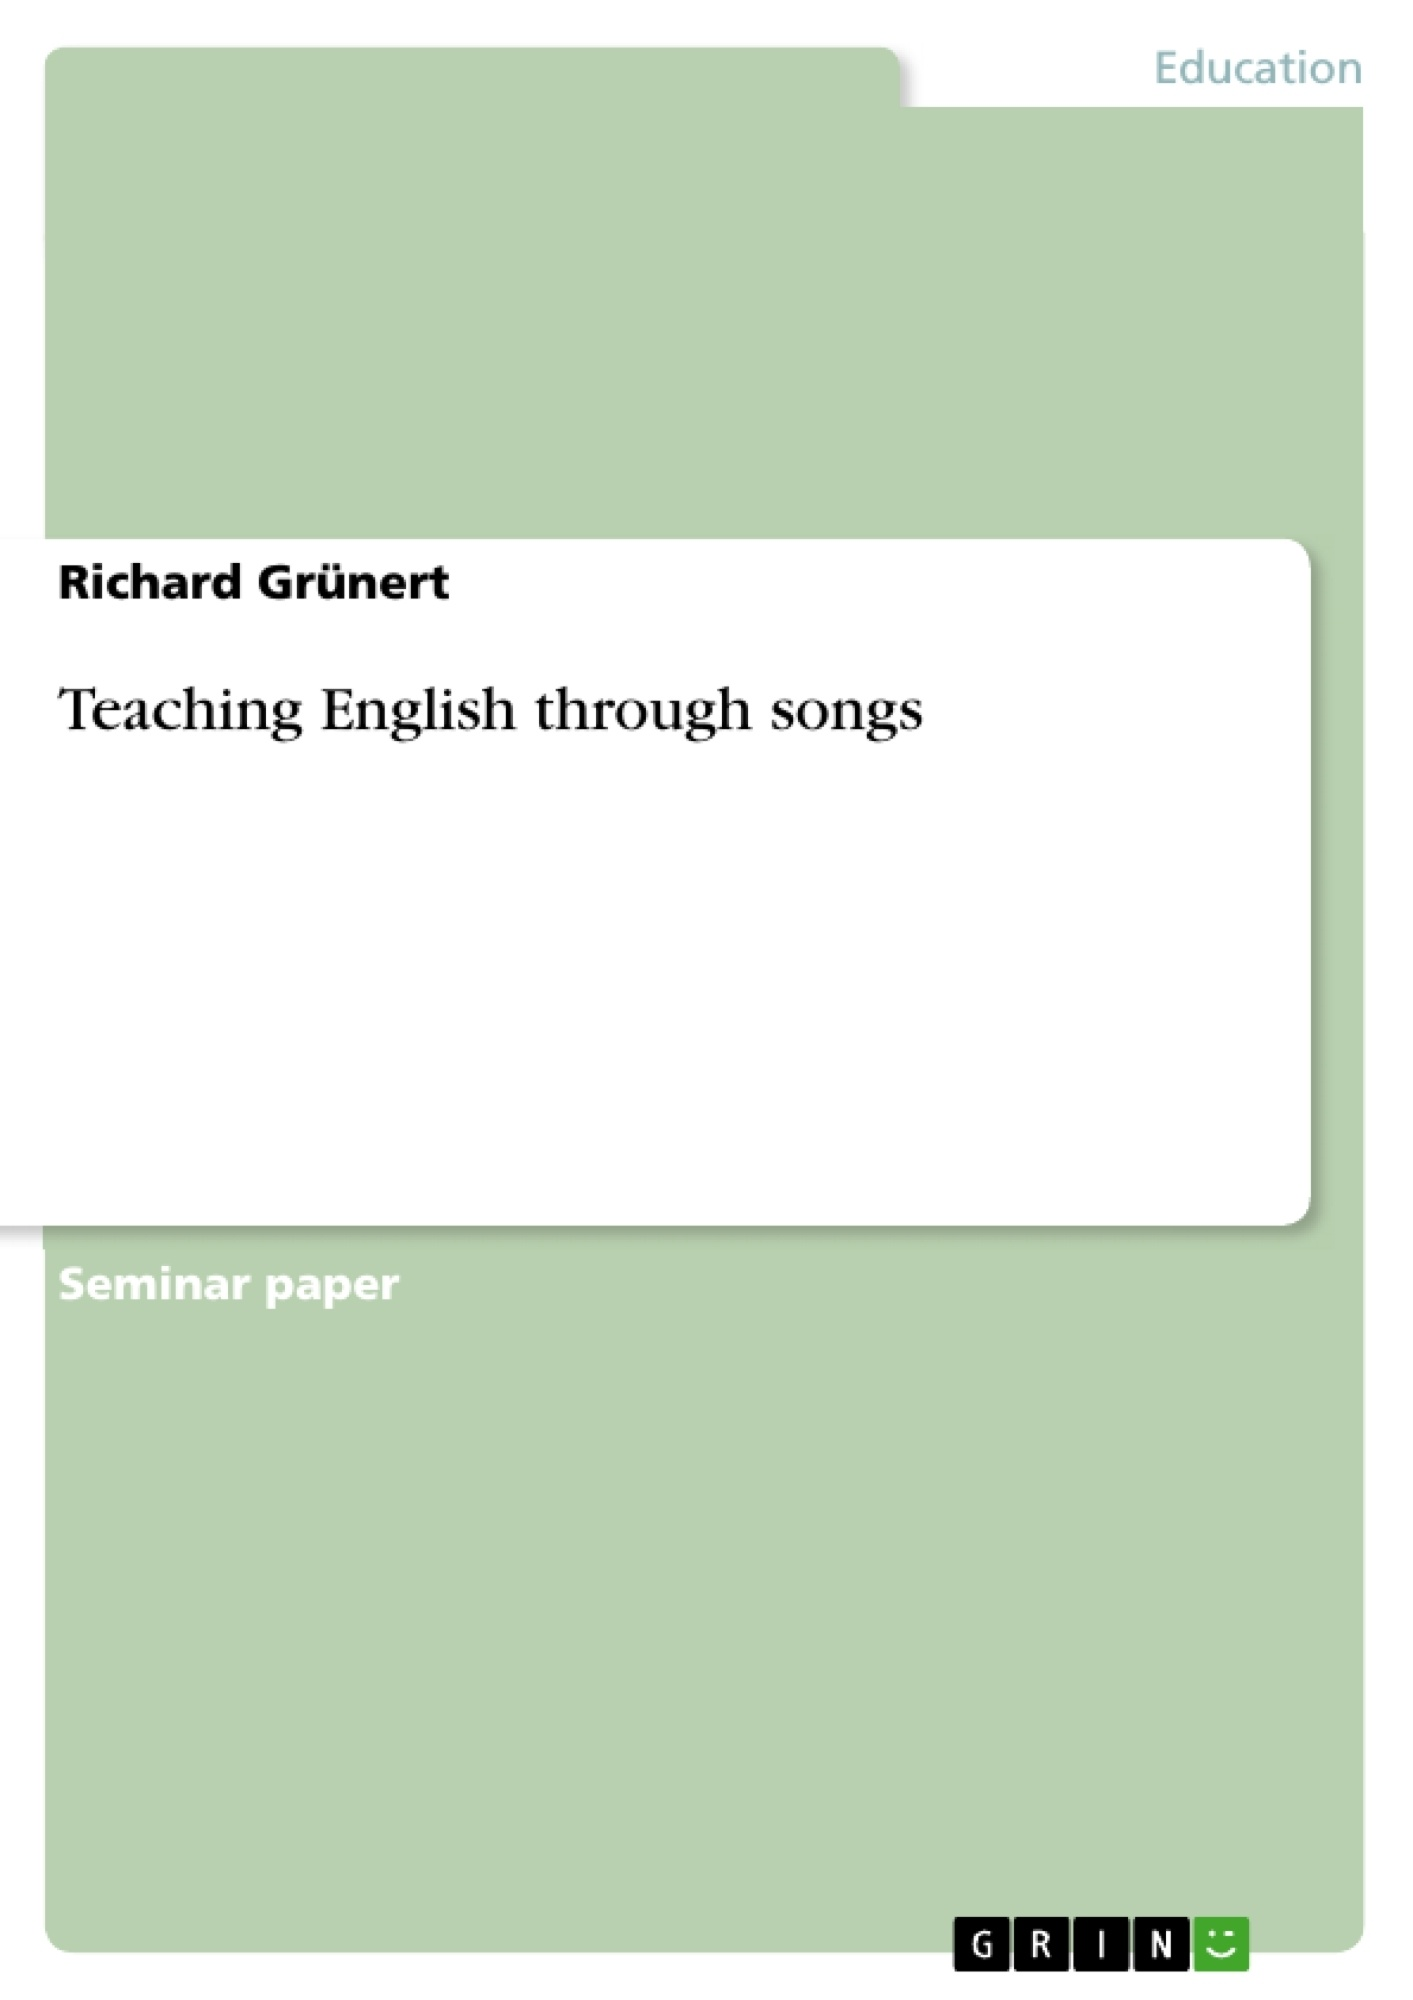 Title: Teaching English through songs